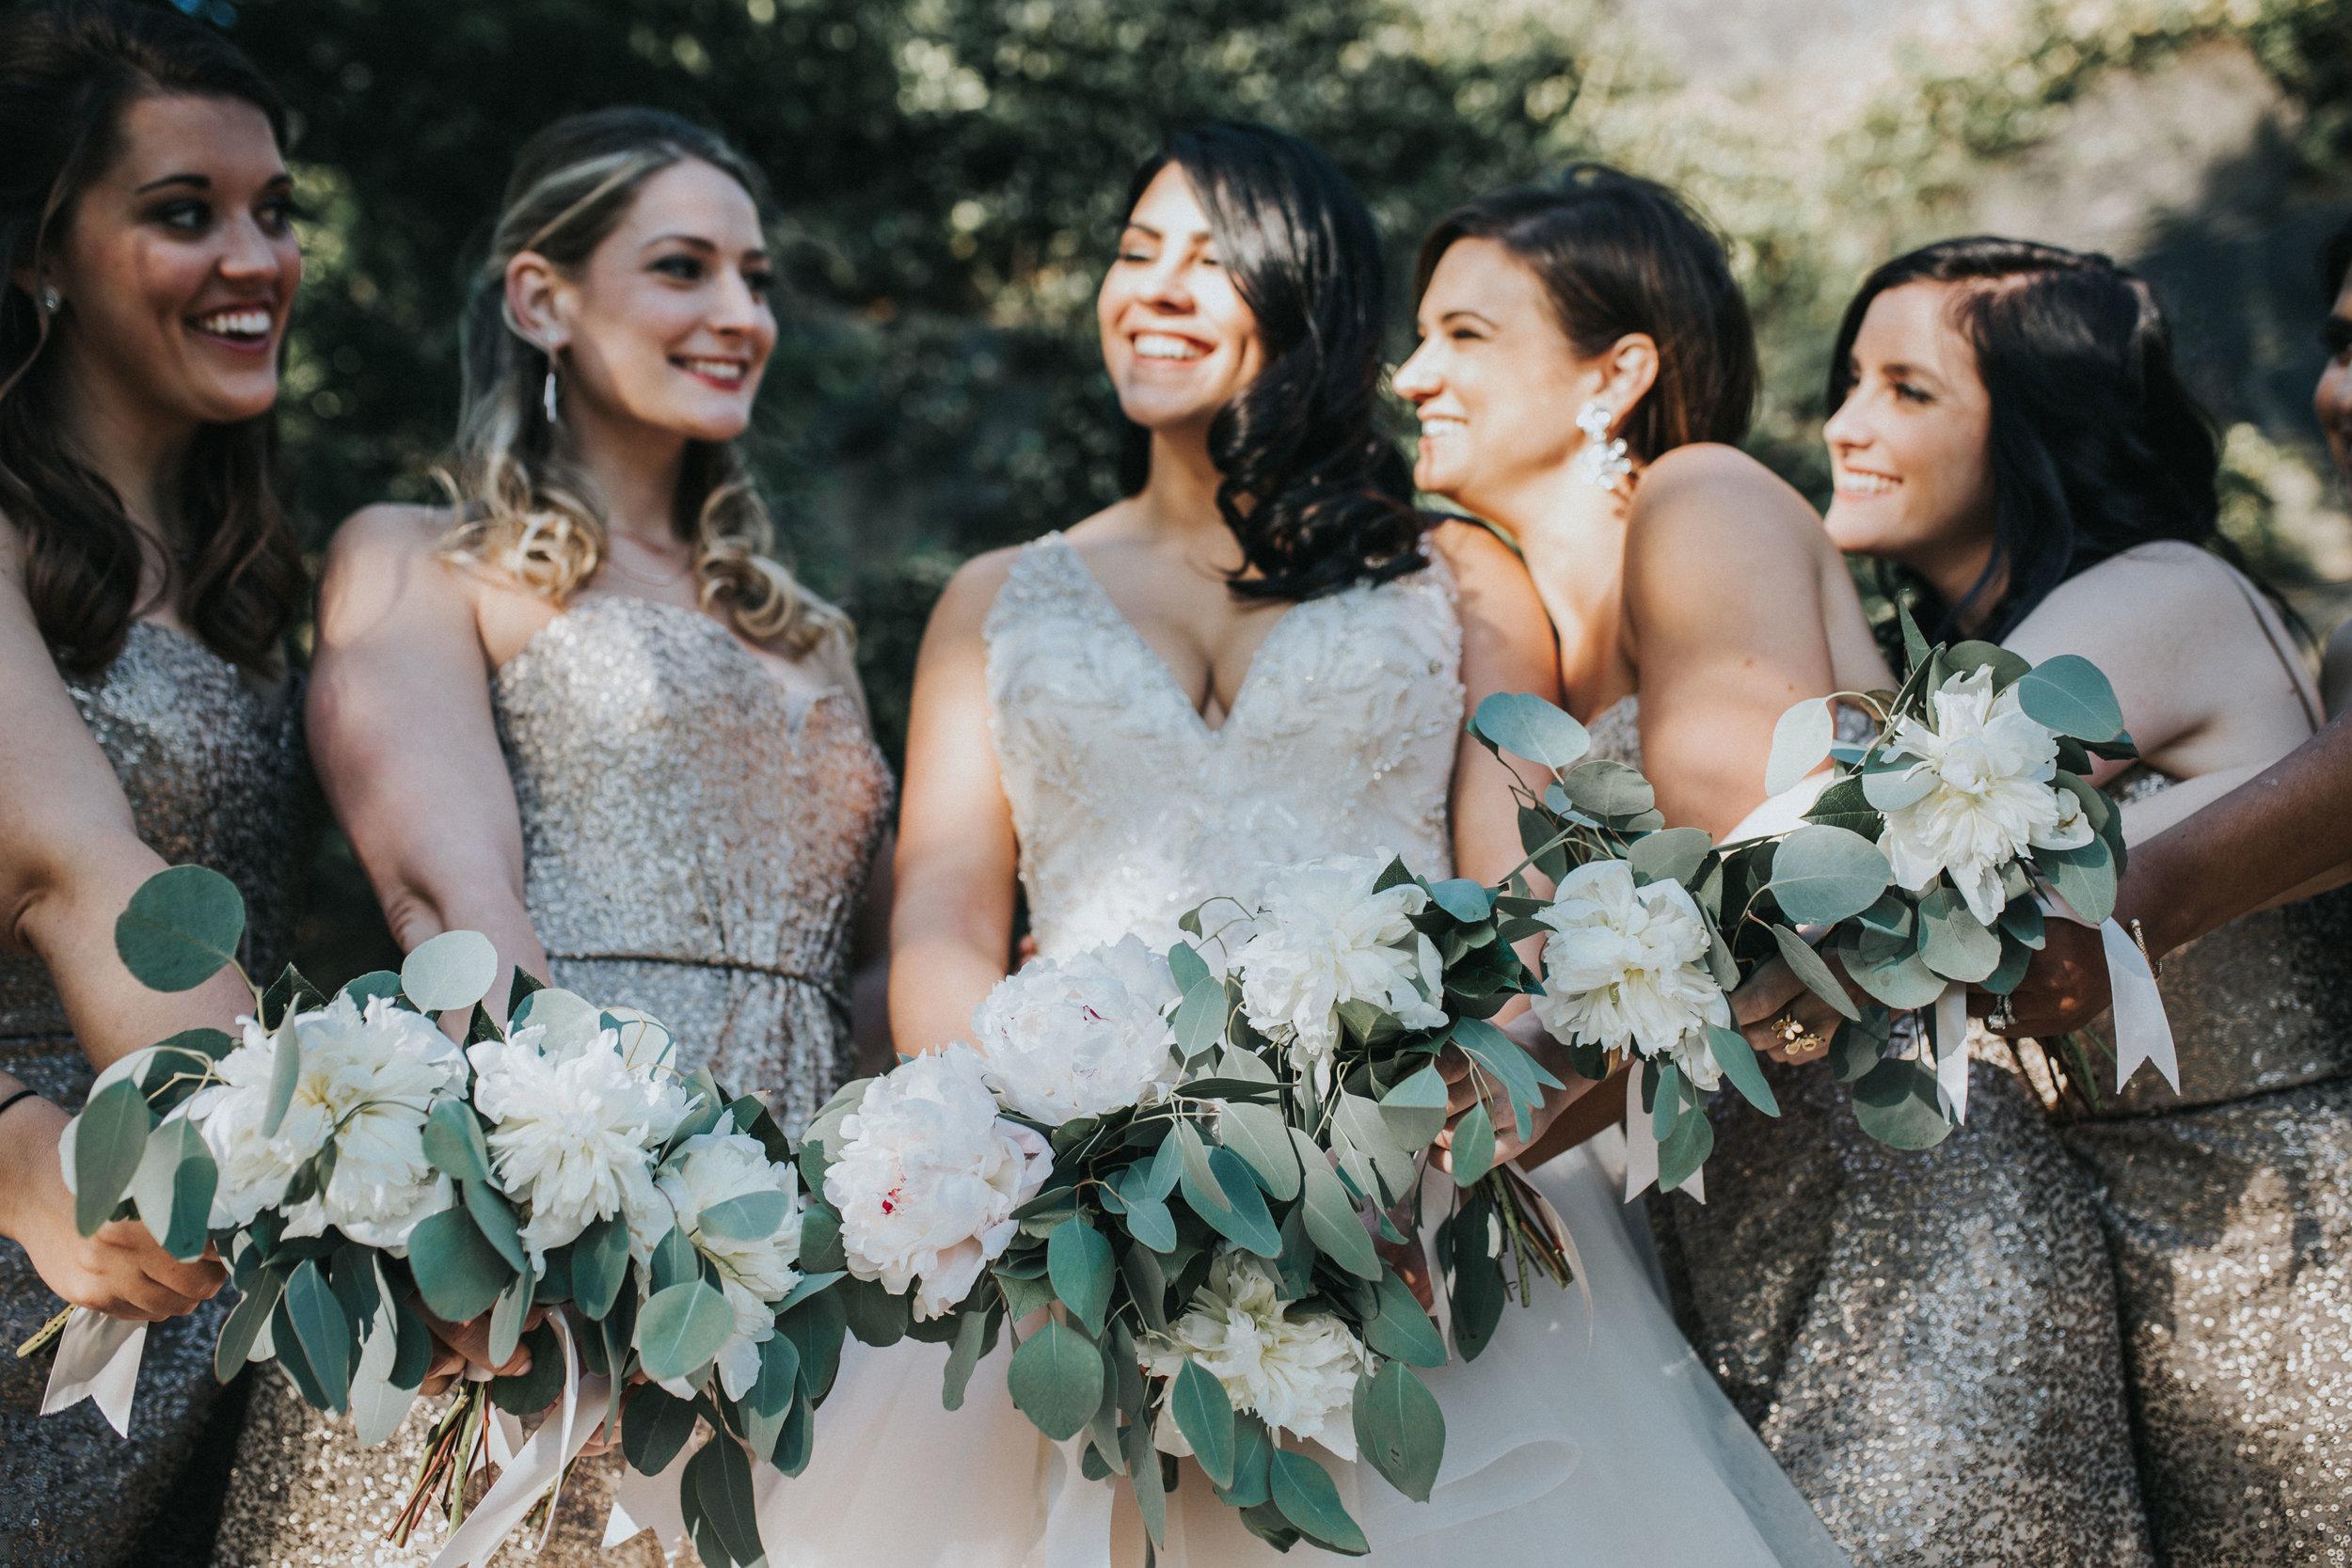 NewJersey_Wedding_Photography_Philadelphia__cescaphe_Waterworks_BridalParty-57.jpg